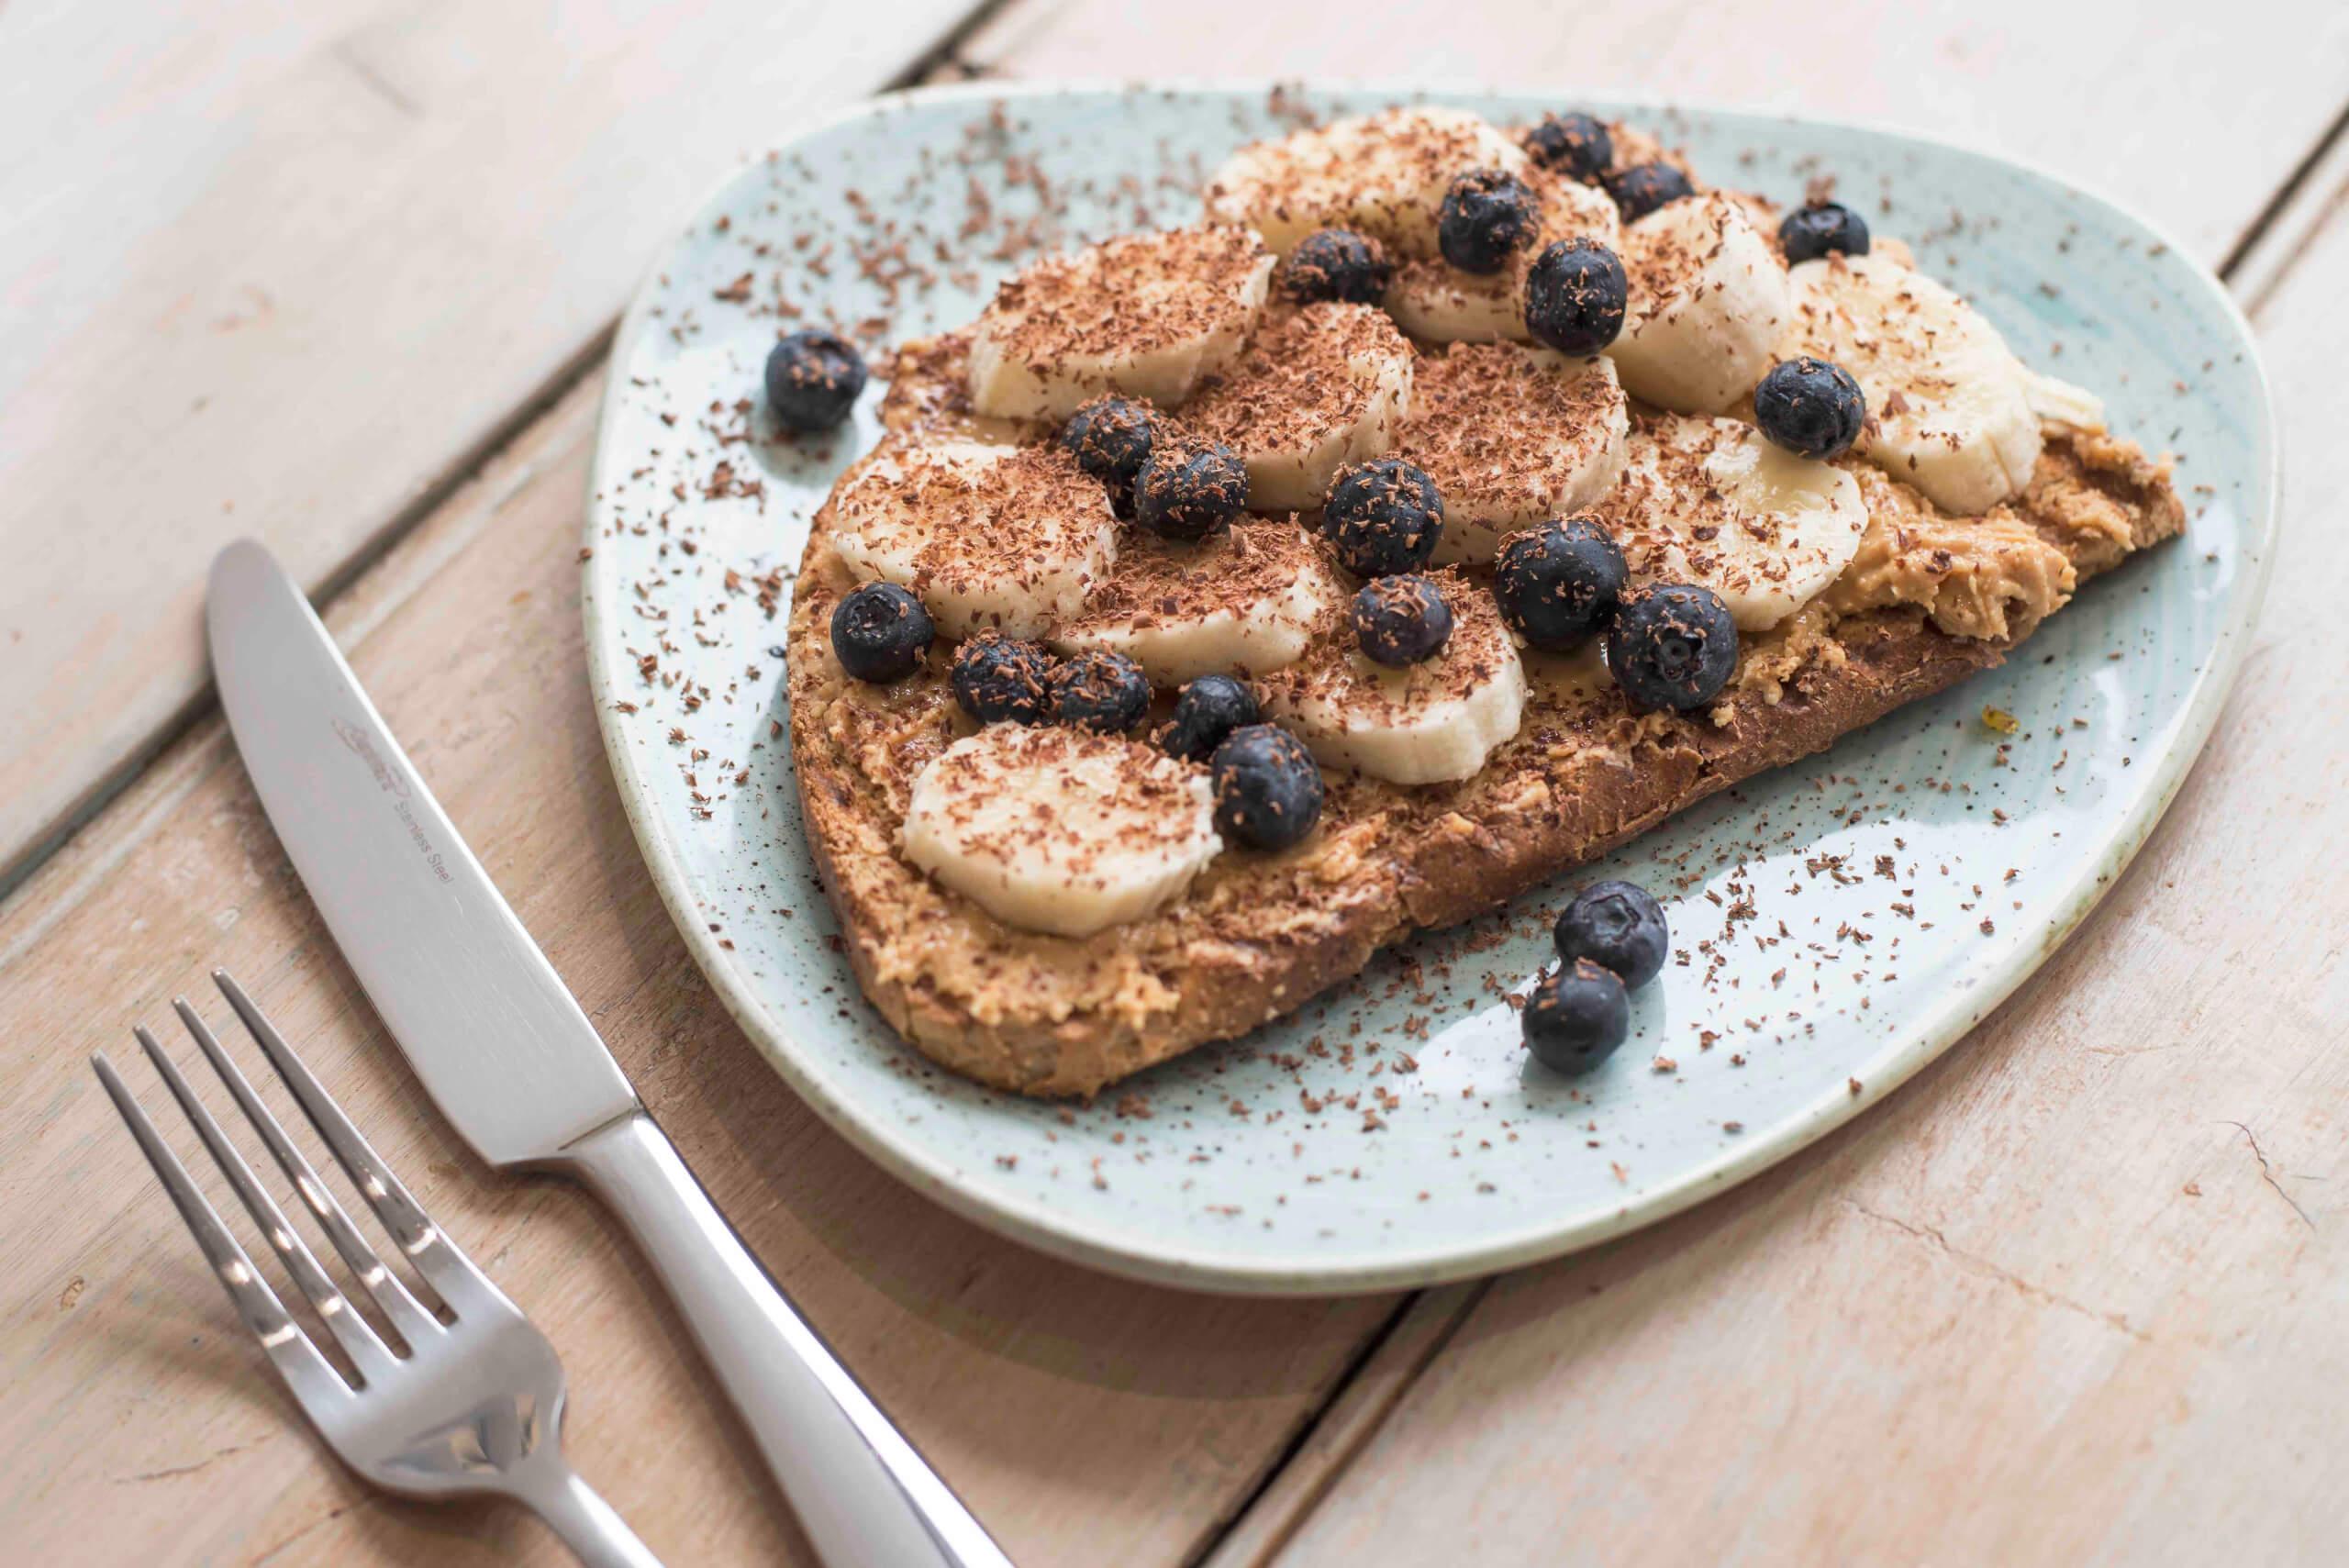 Photo 5 (credit Kirsty Owen) - Jaz & Jul's weekday breakfast toast cocoa shavings banana peanut butter blueberries-3